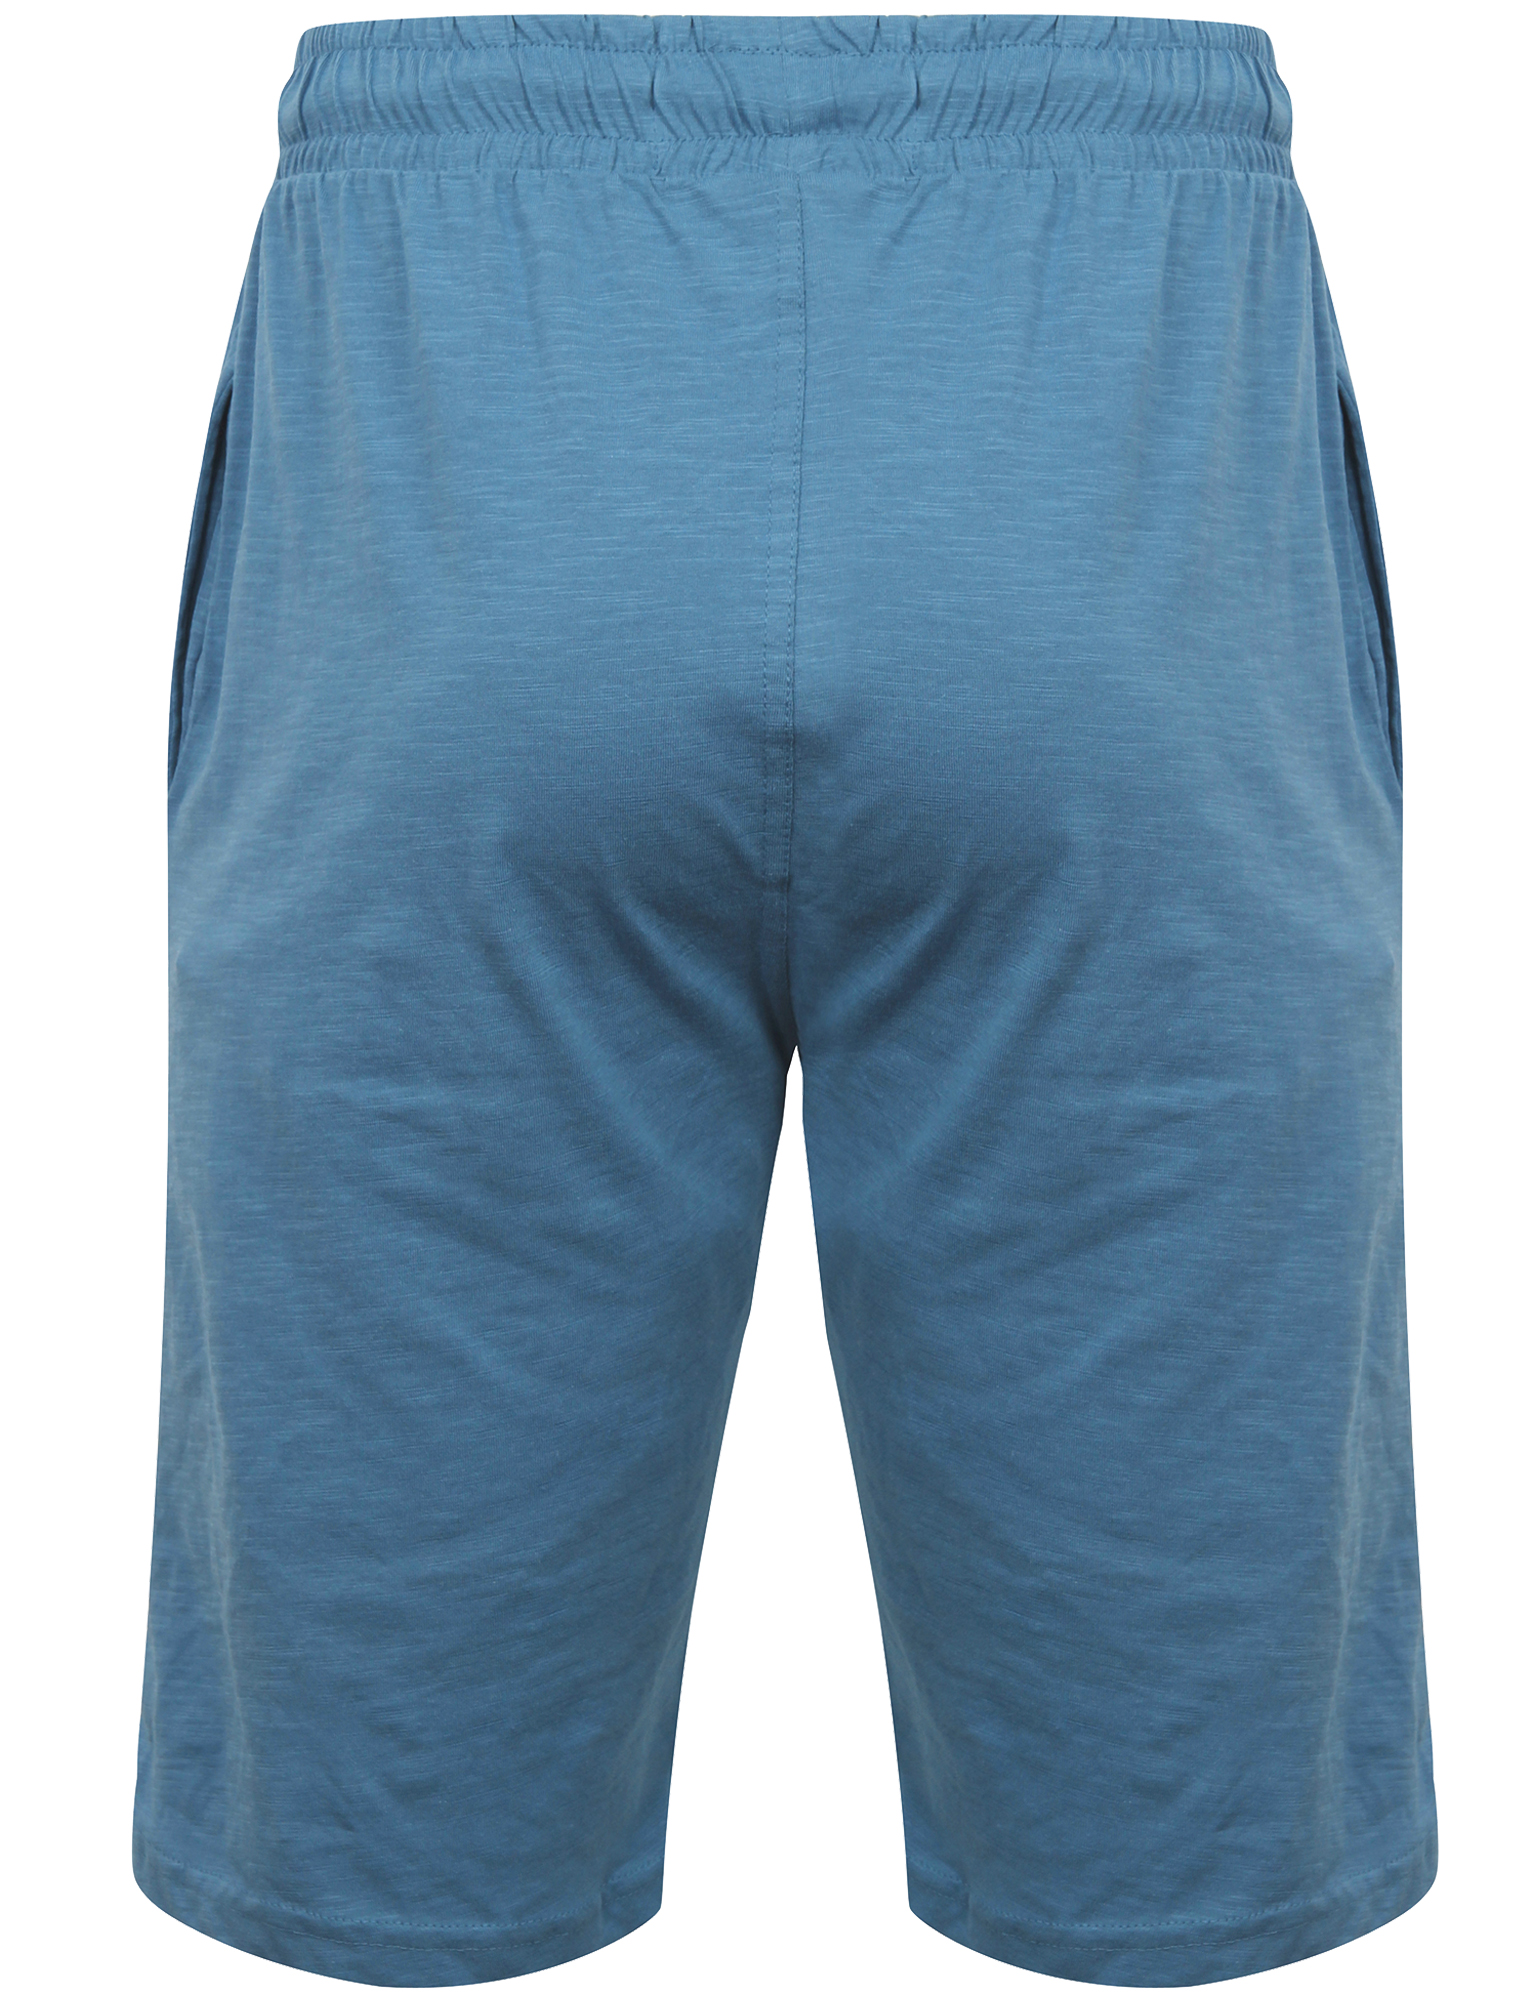 Tokyo-Laundry-Men-039-s-Gough-Cotton-Short-Sleeve-Pyjamas-PJ-Shorts-Lounge-Wear-Set thumbnail 11